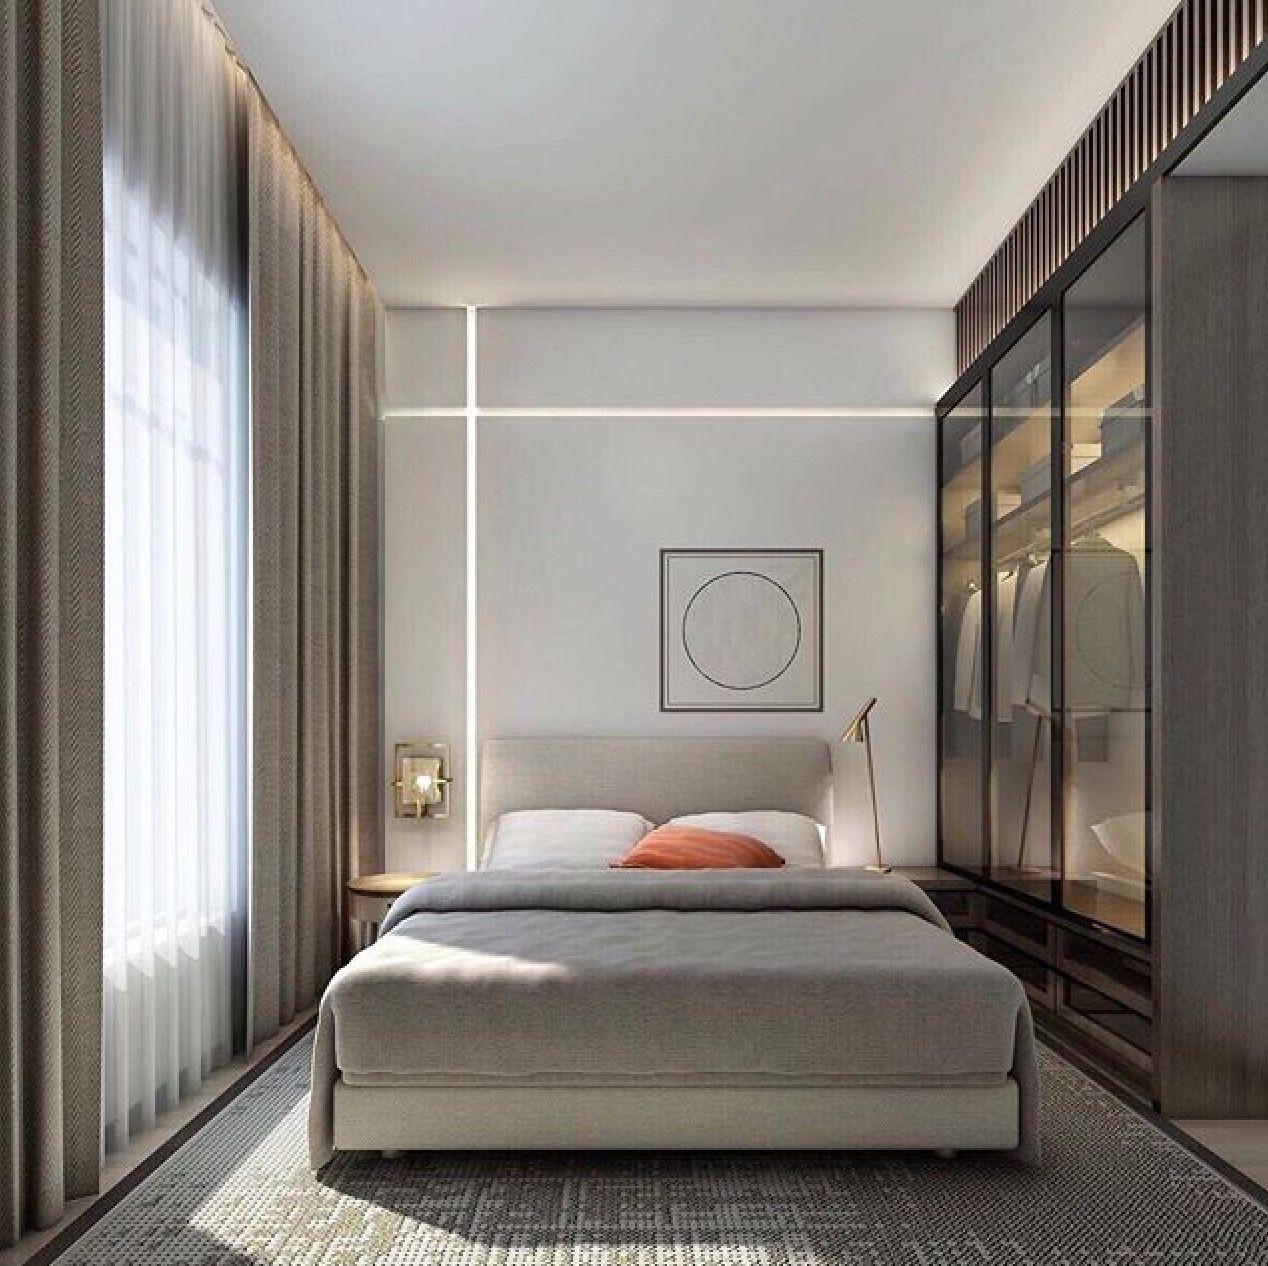 Bedroom. | Apartment bedroom decor, Small apartment ...